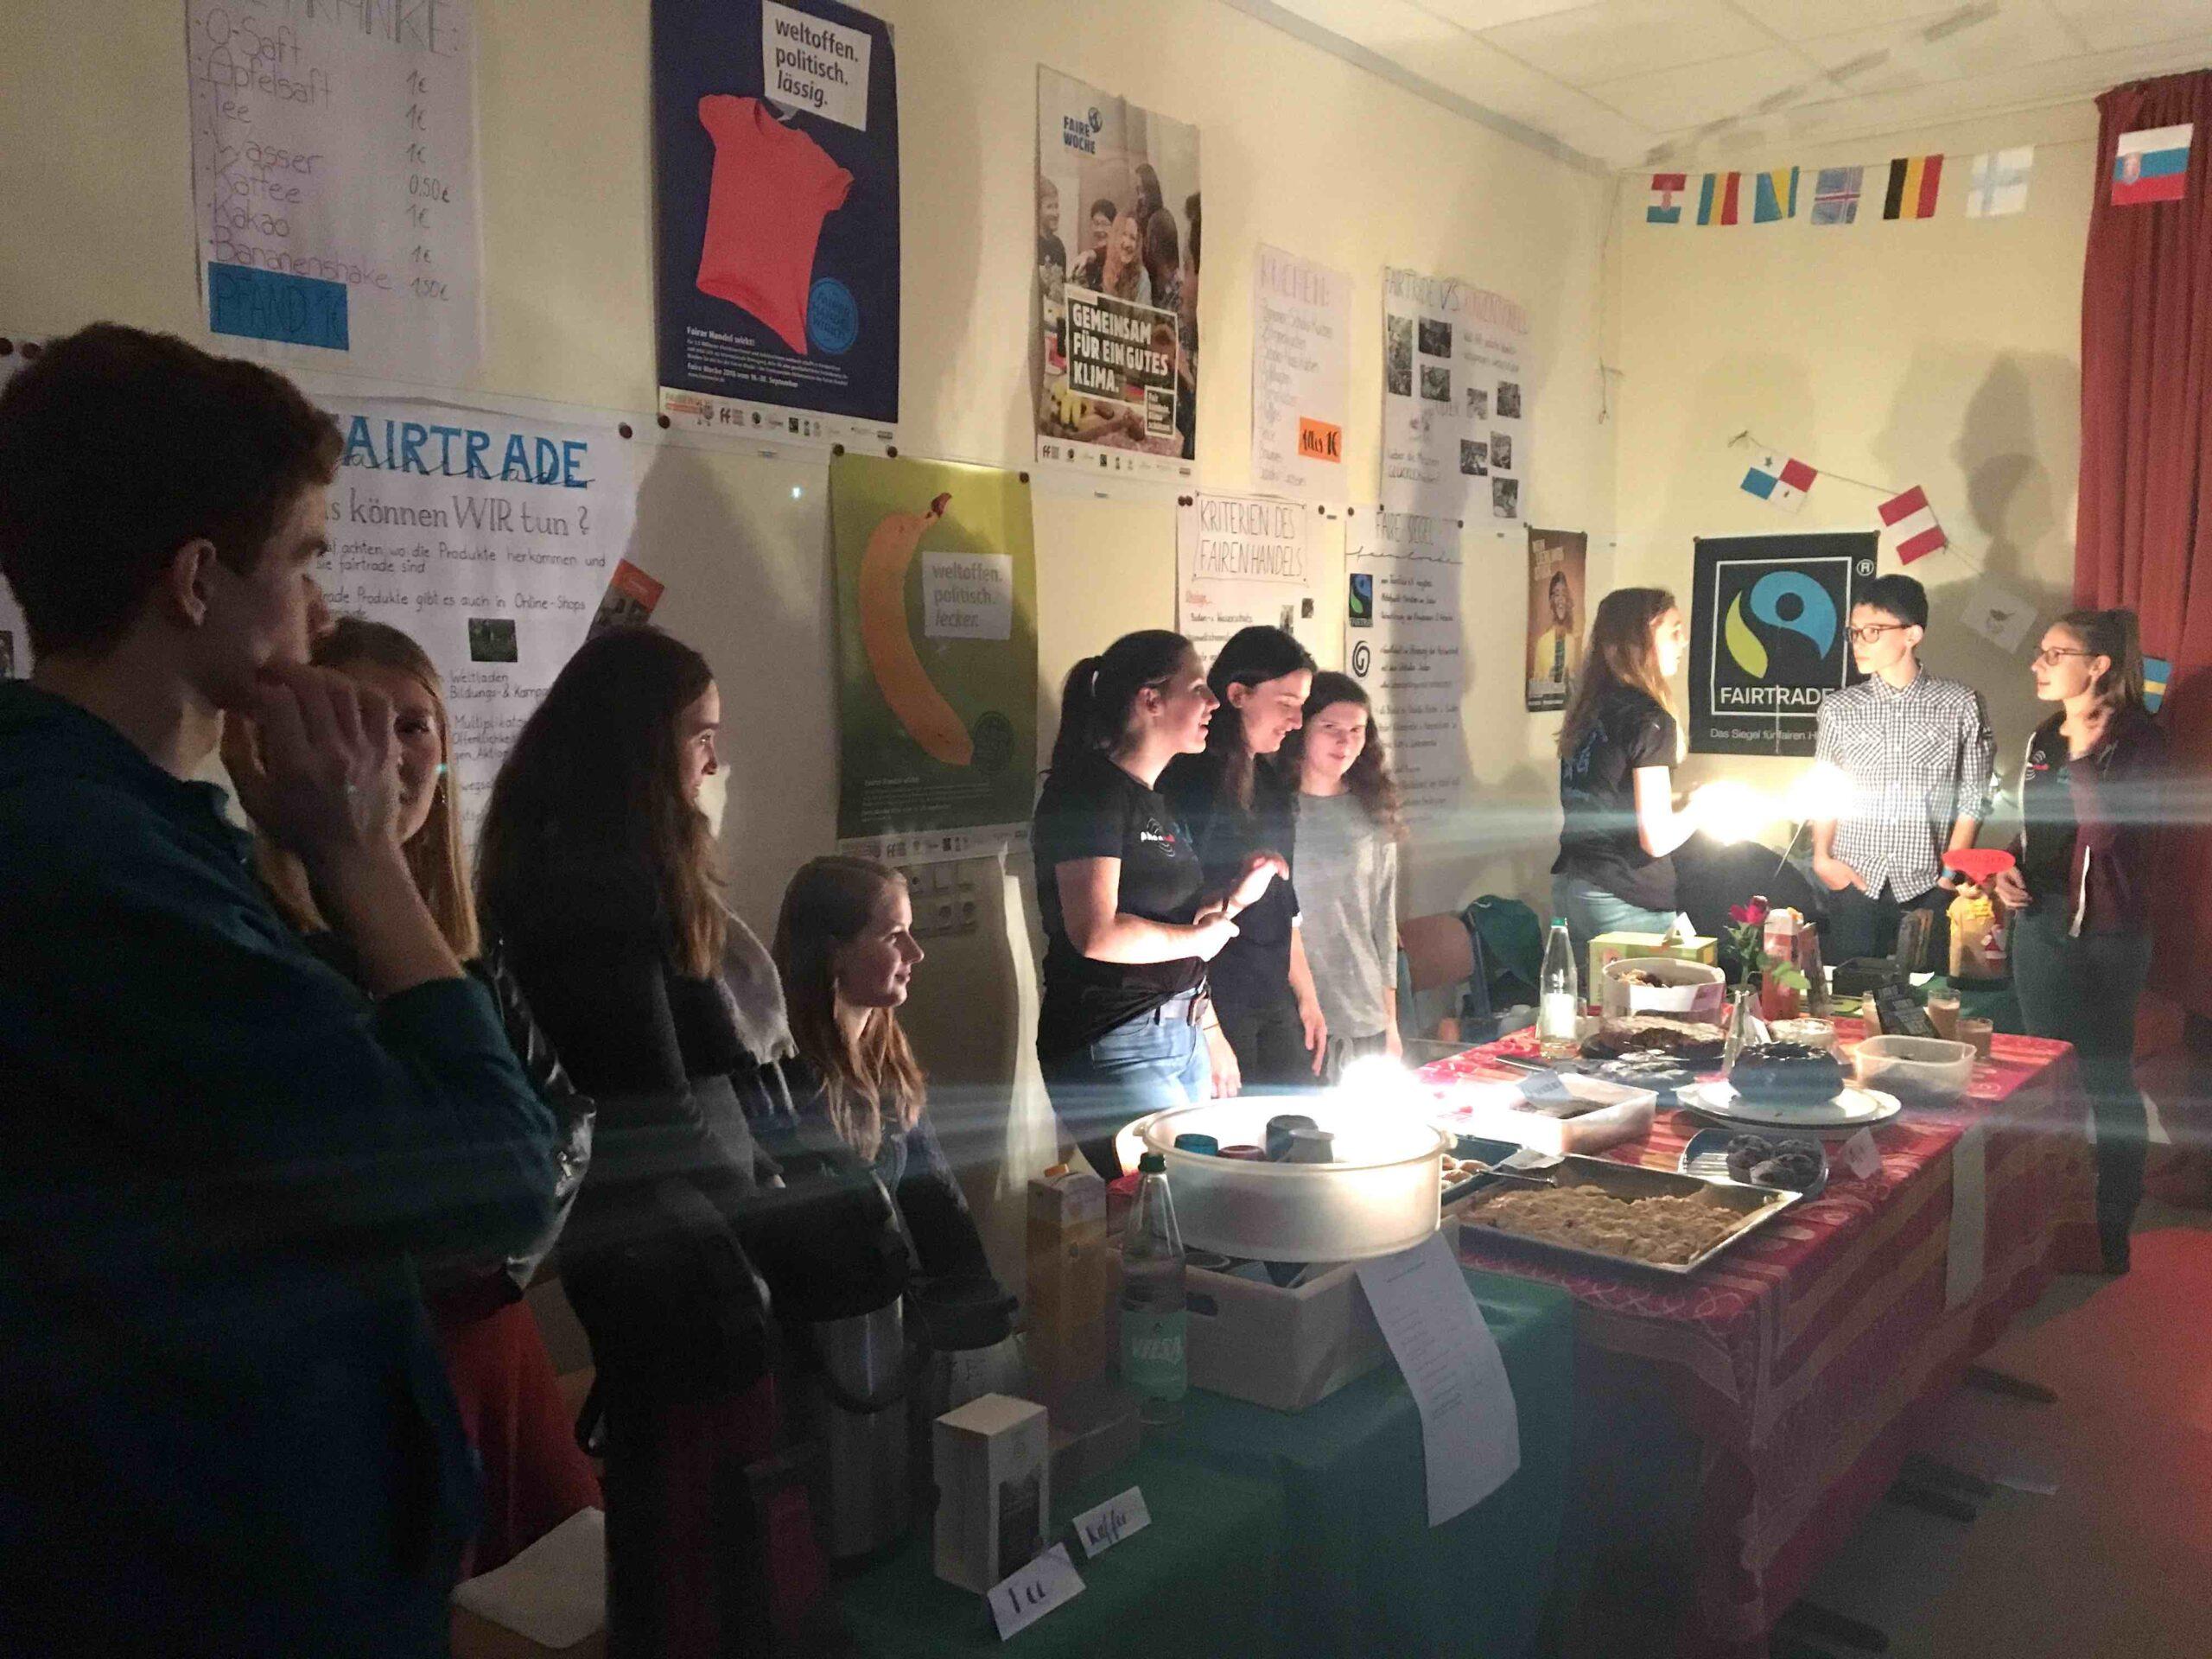 WPK organisiert faires Café zur Lesenacht 2018